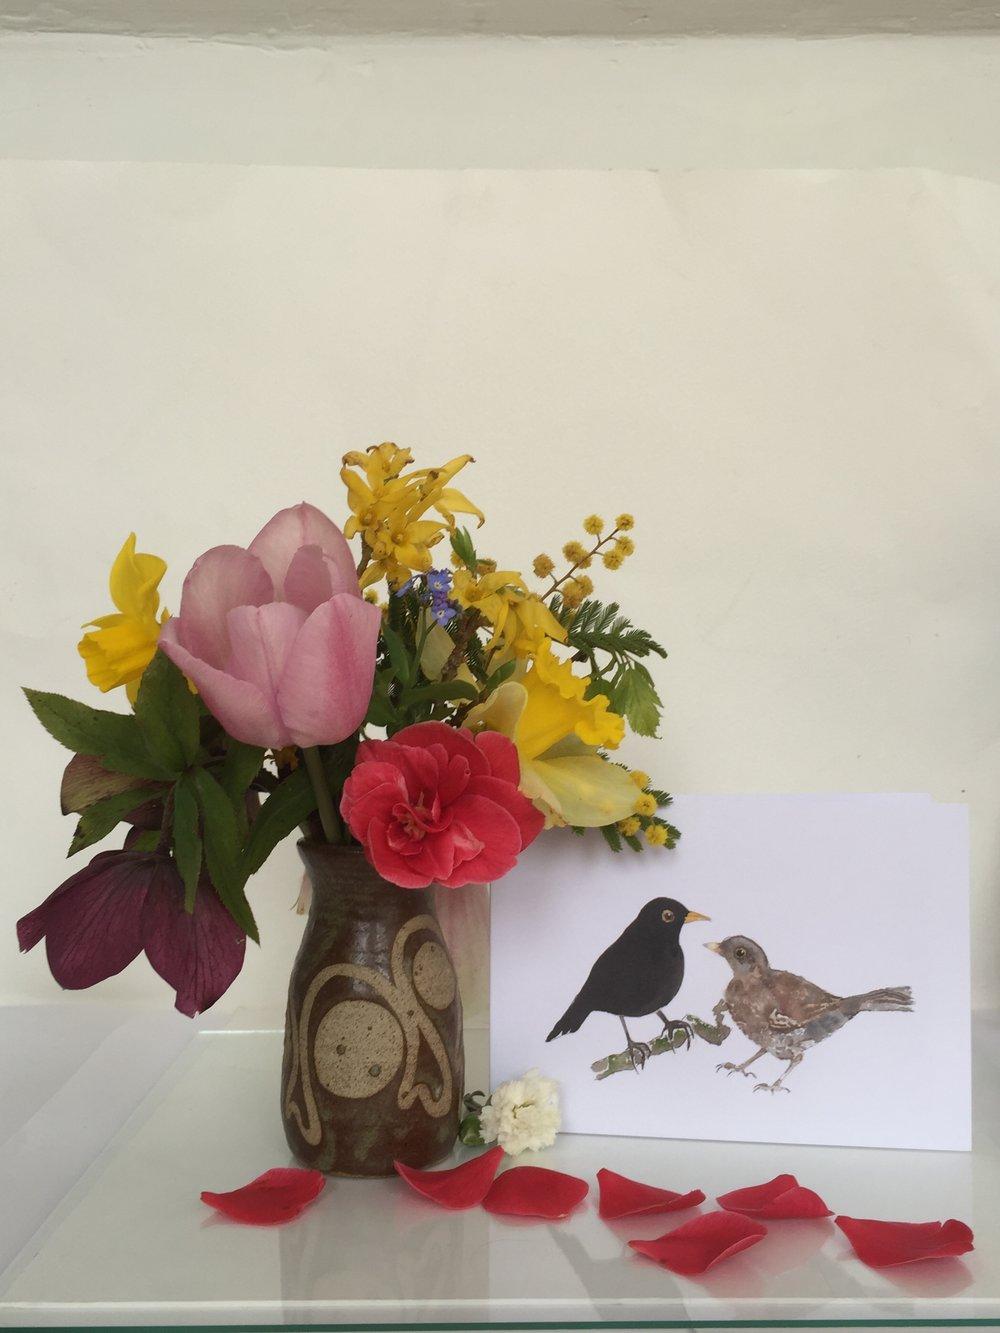 Pair of blackbirds - detail